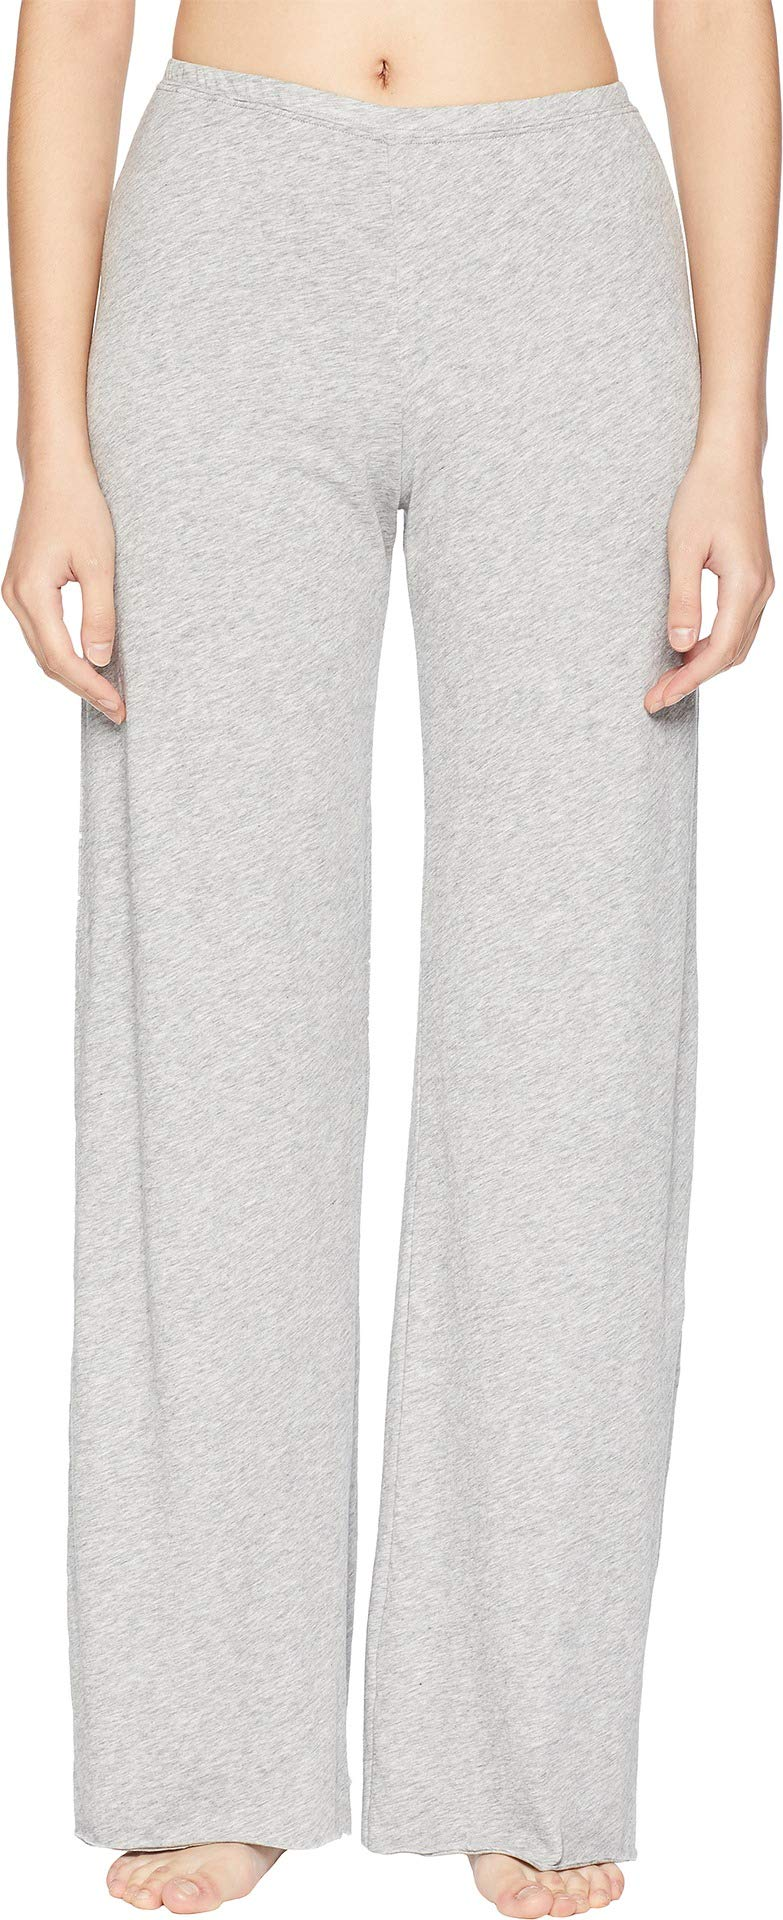 Skin Women's Double Layer Pants Heather Grey 0